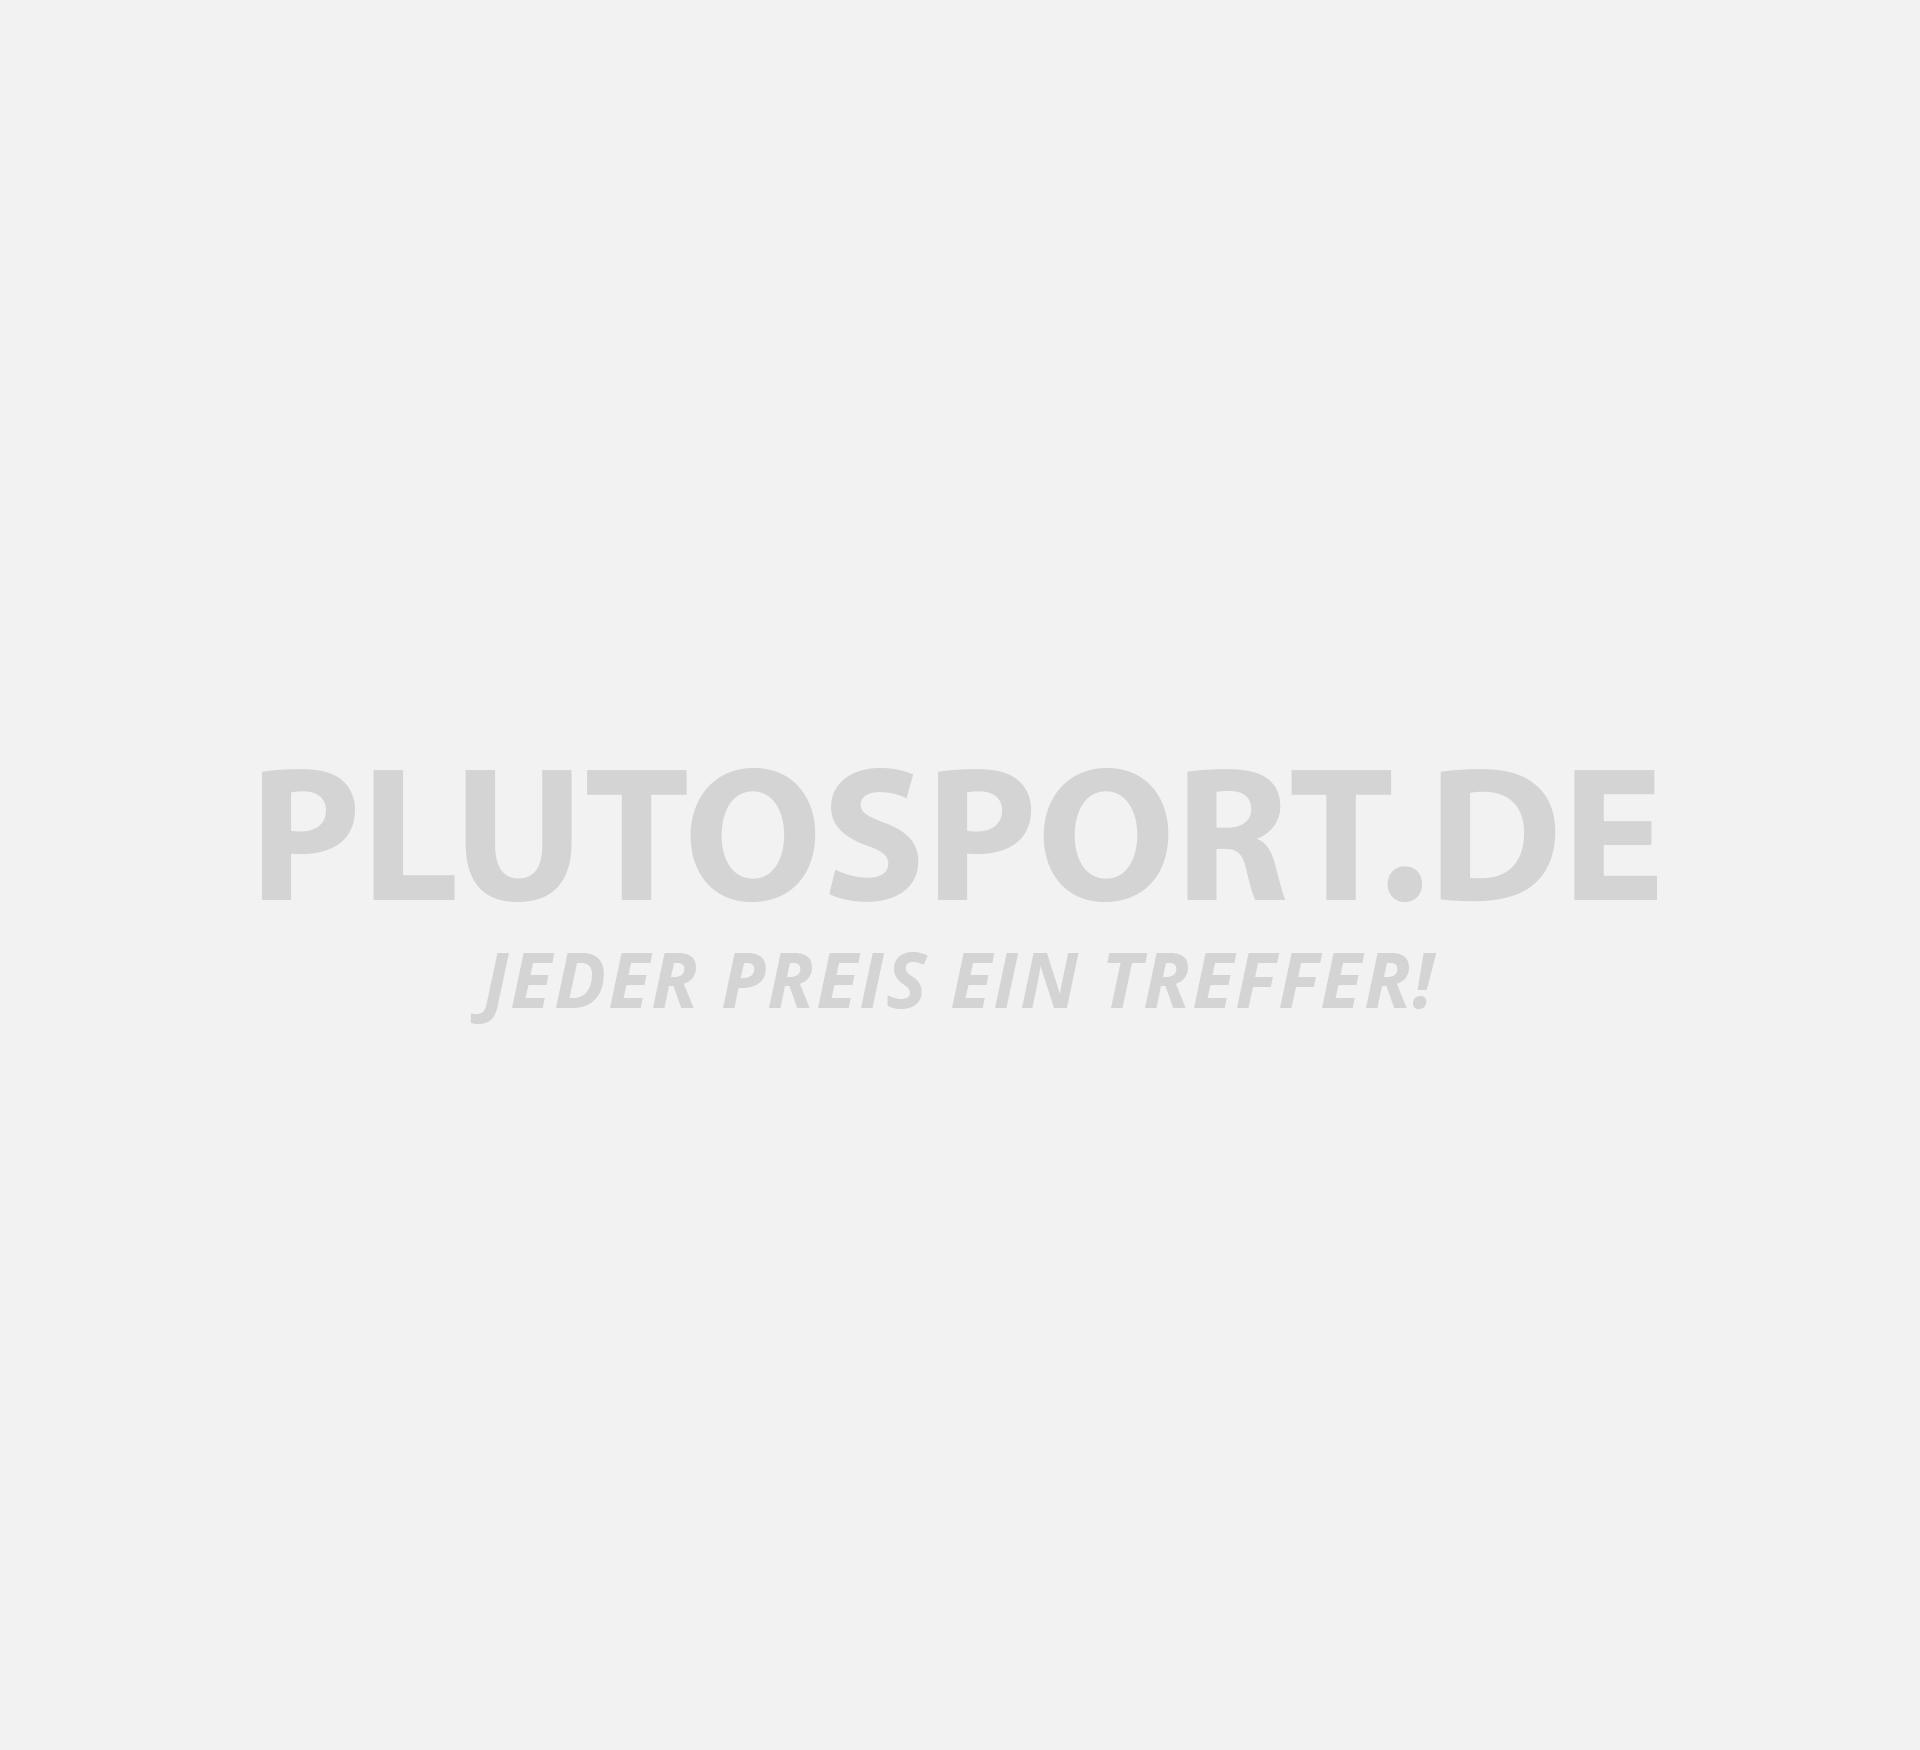 Nike Pro Combat Patella Springers Knieband 2.0